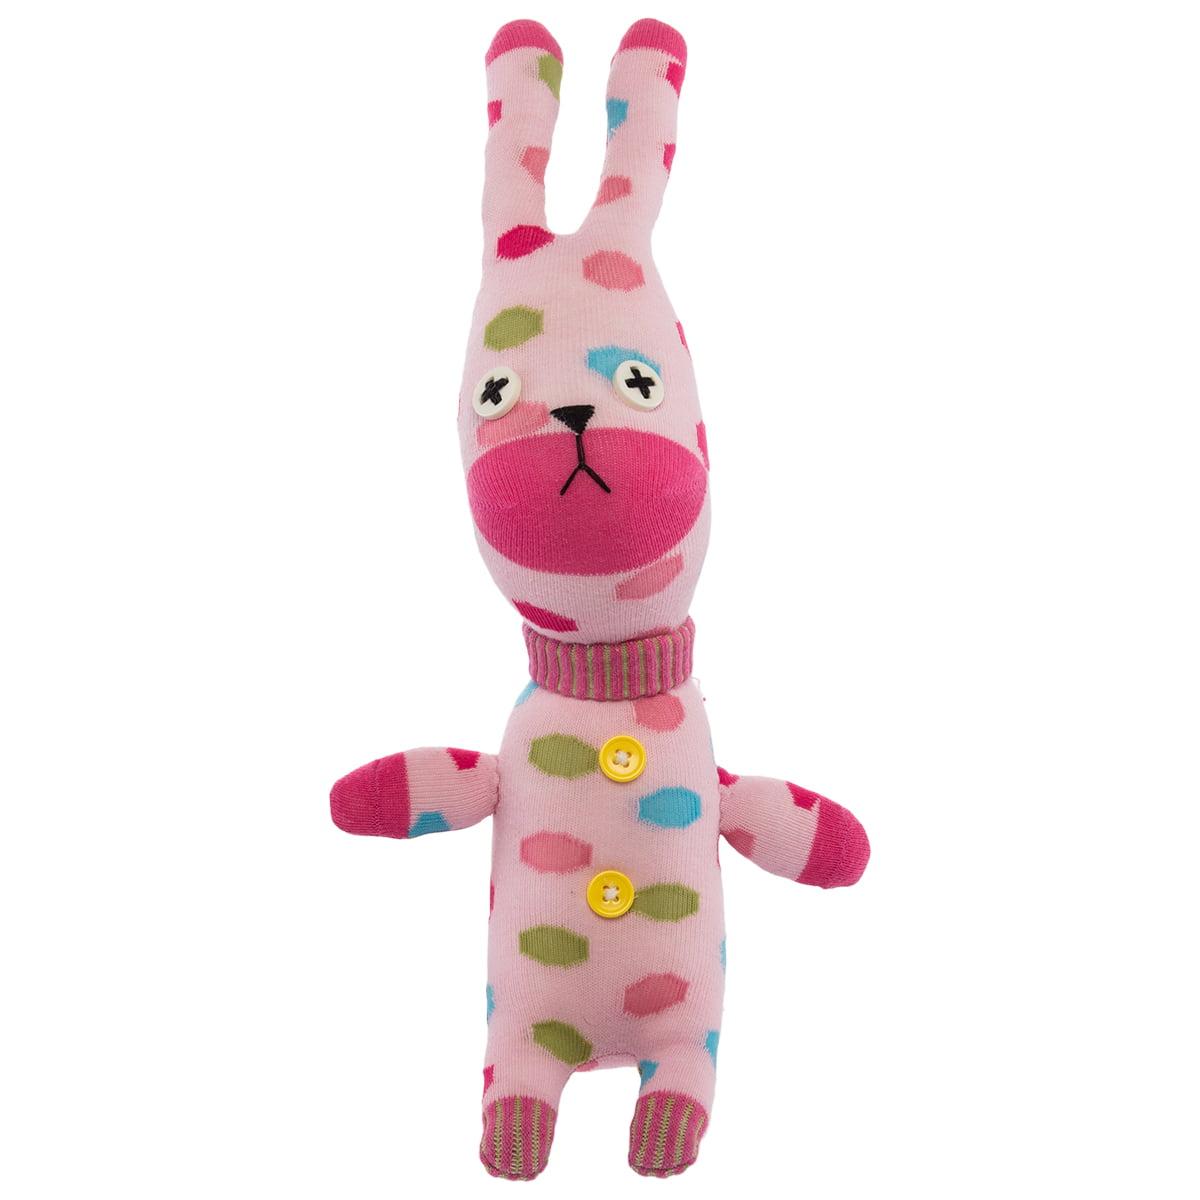 Sockabout Emiko Bunny Rabbit Sock Monkey Plush Kids Toy Childrens